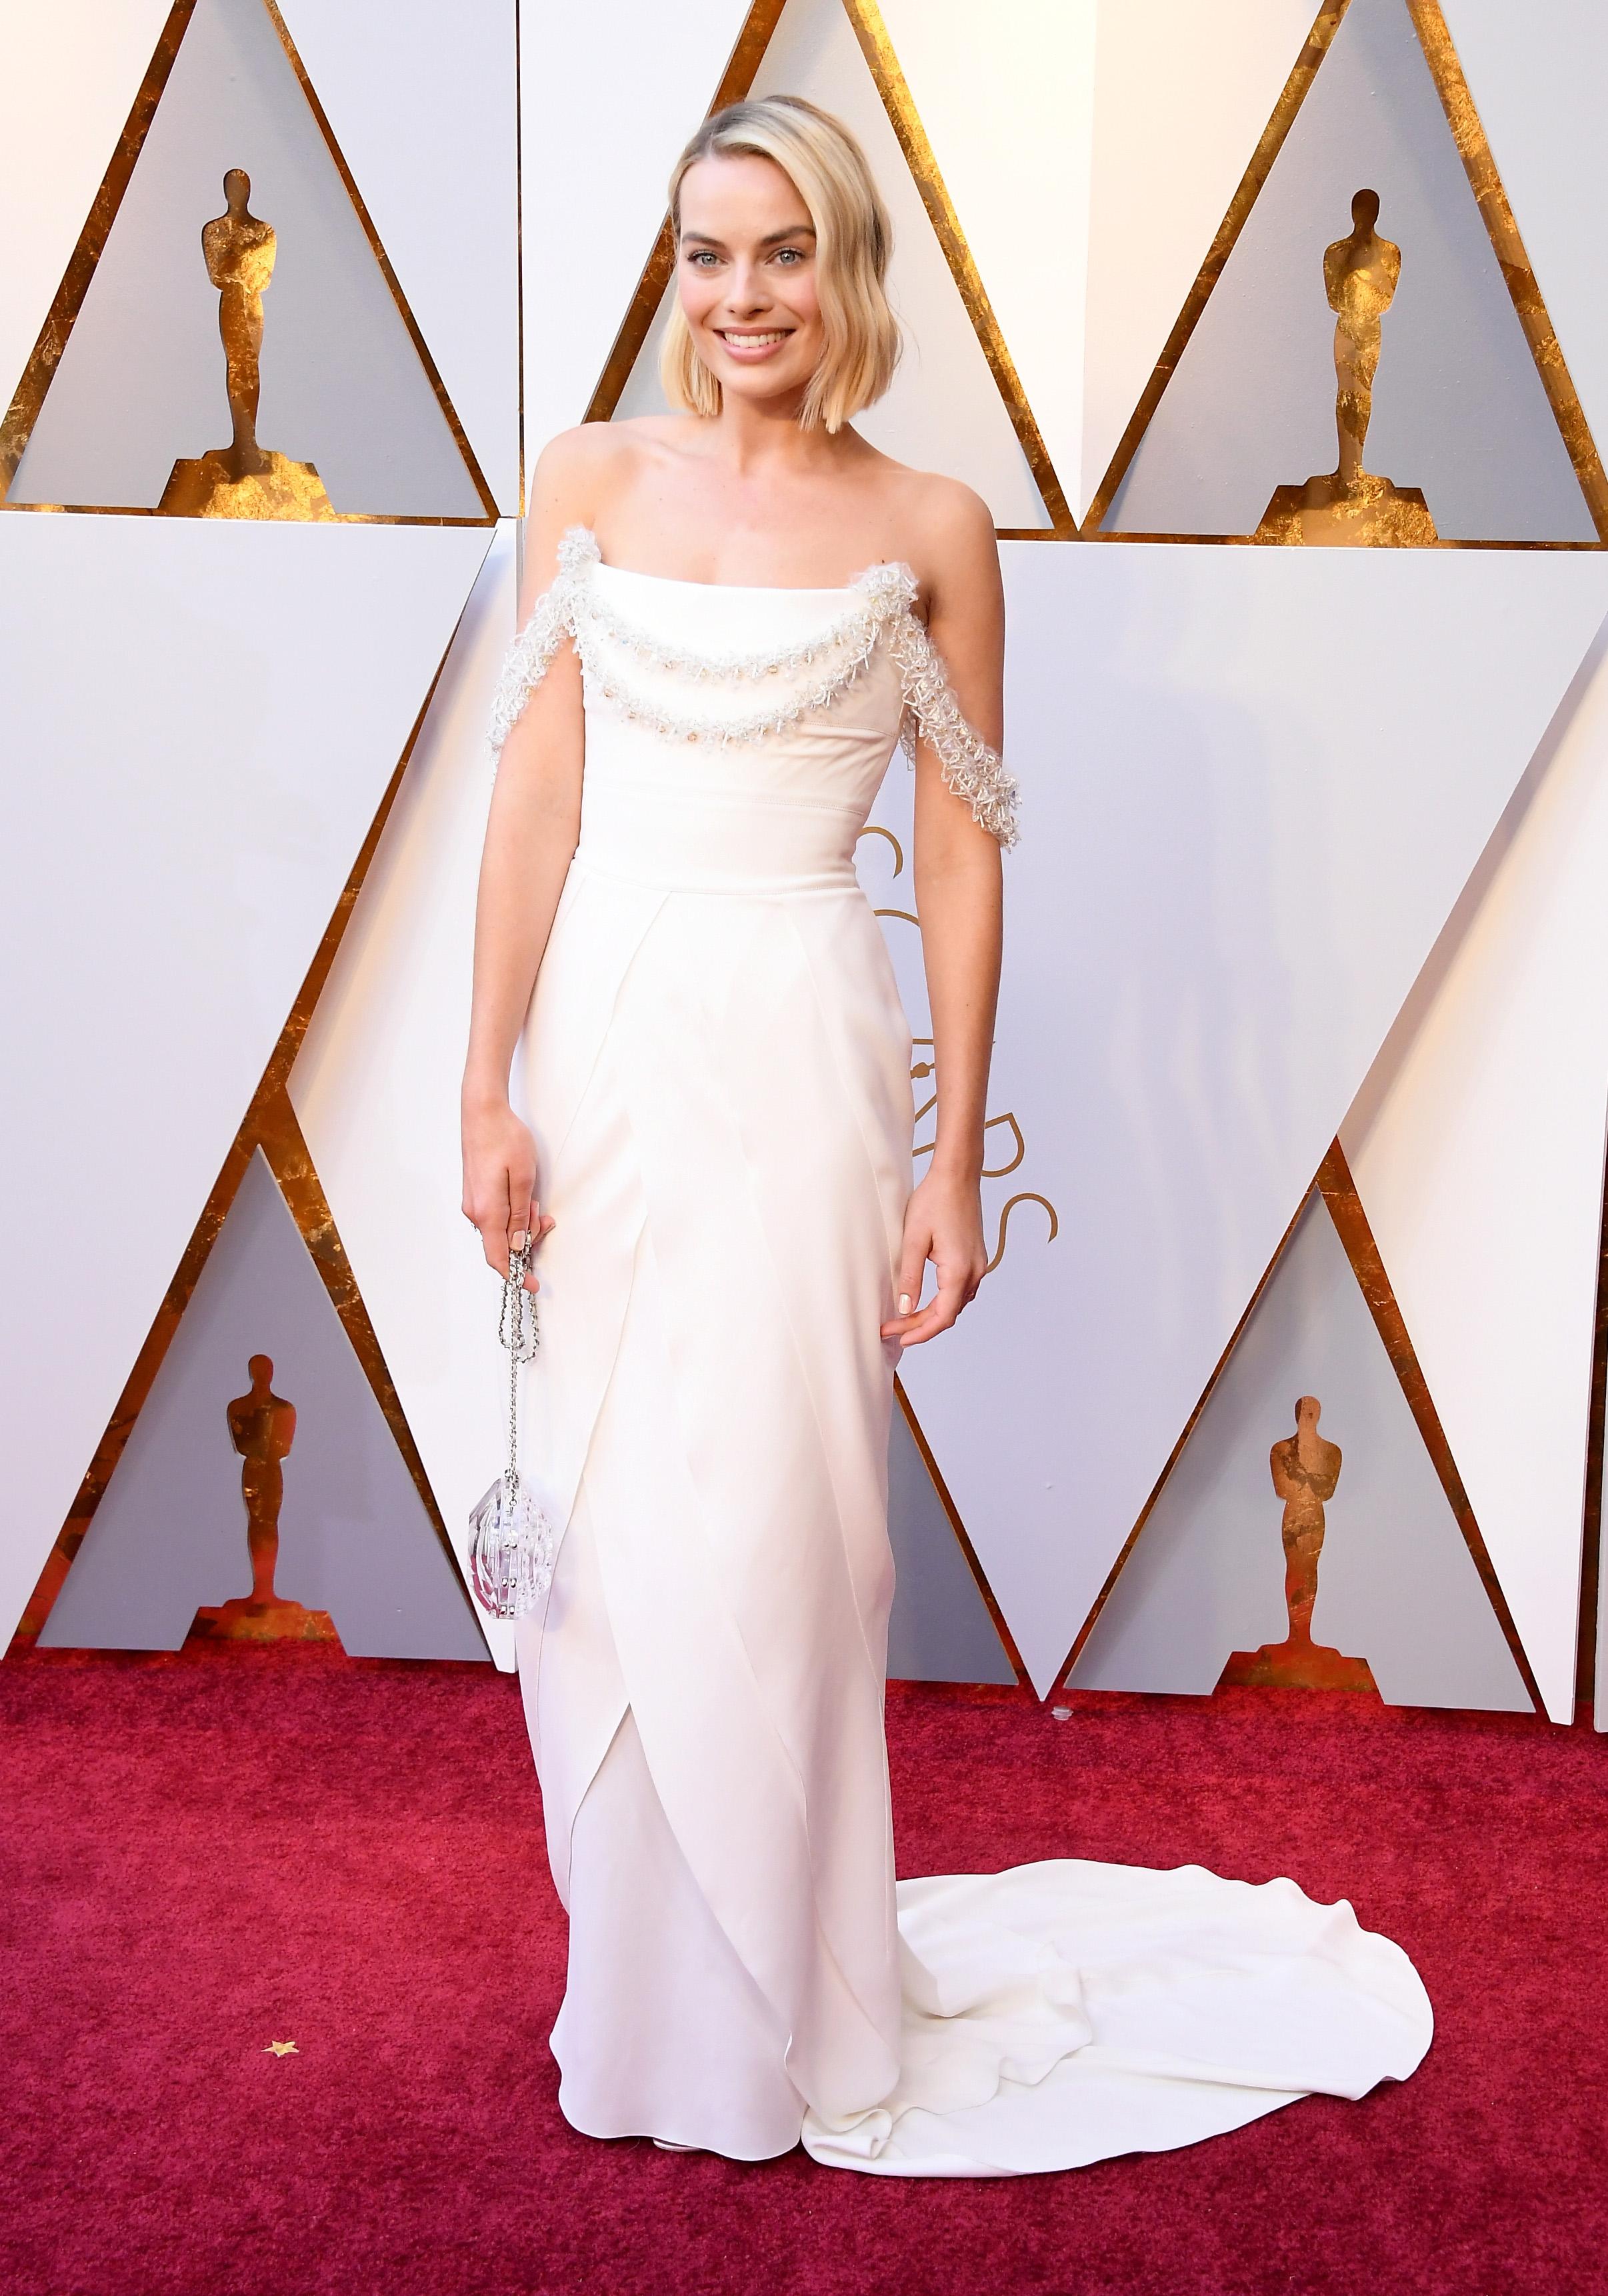 Nữ diễn viên Margot Robbie trên thảm đỏ Oscar